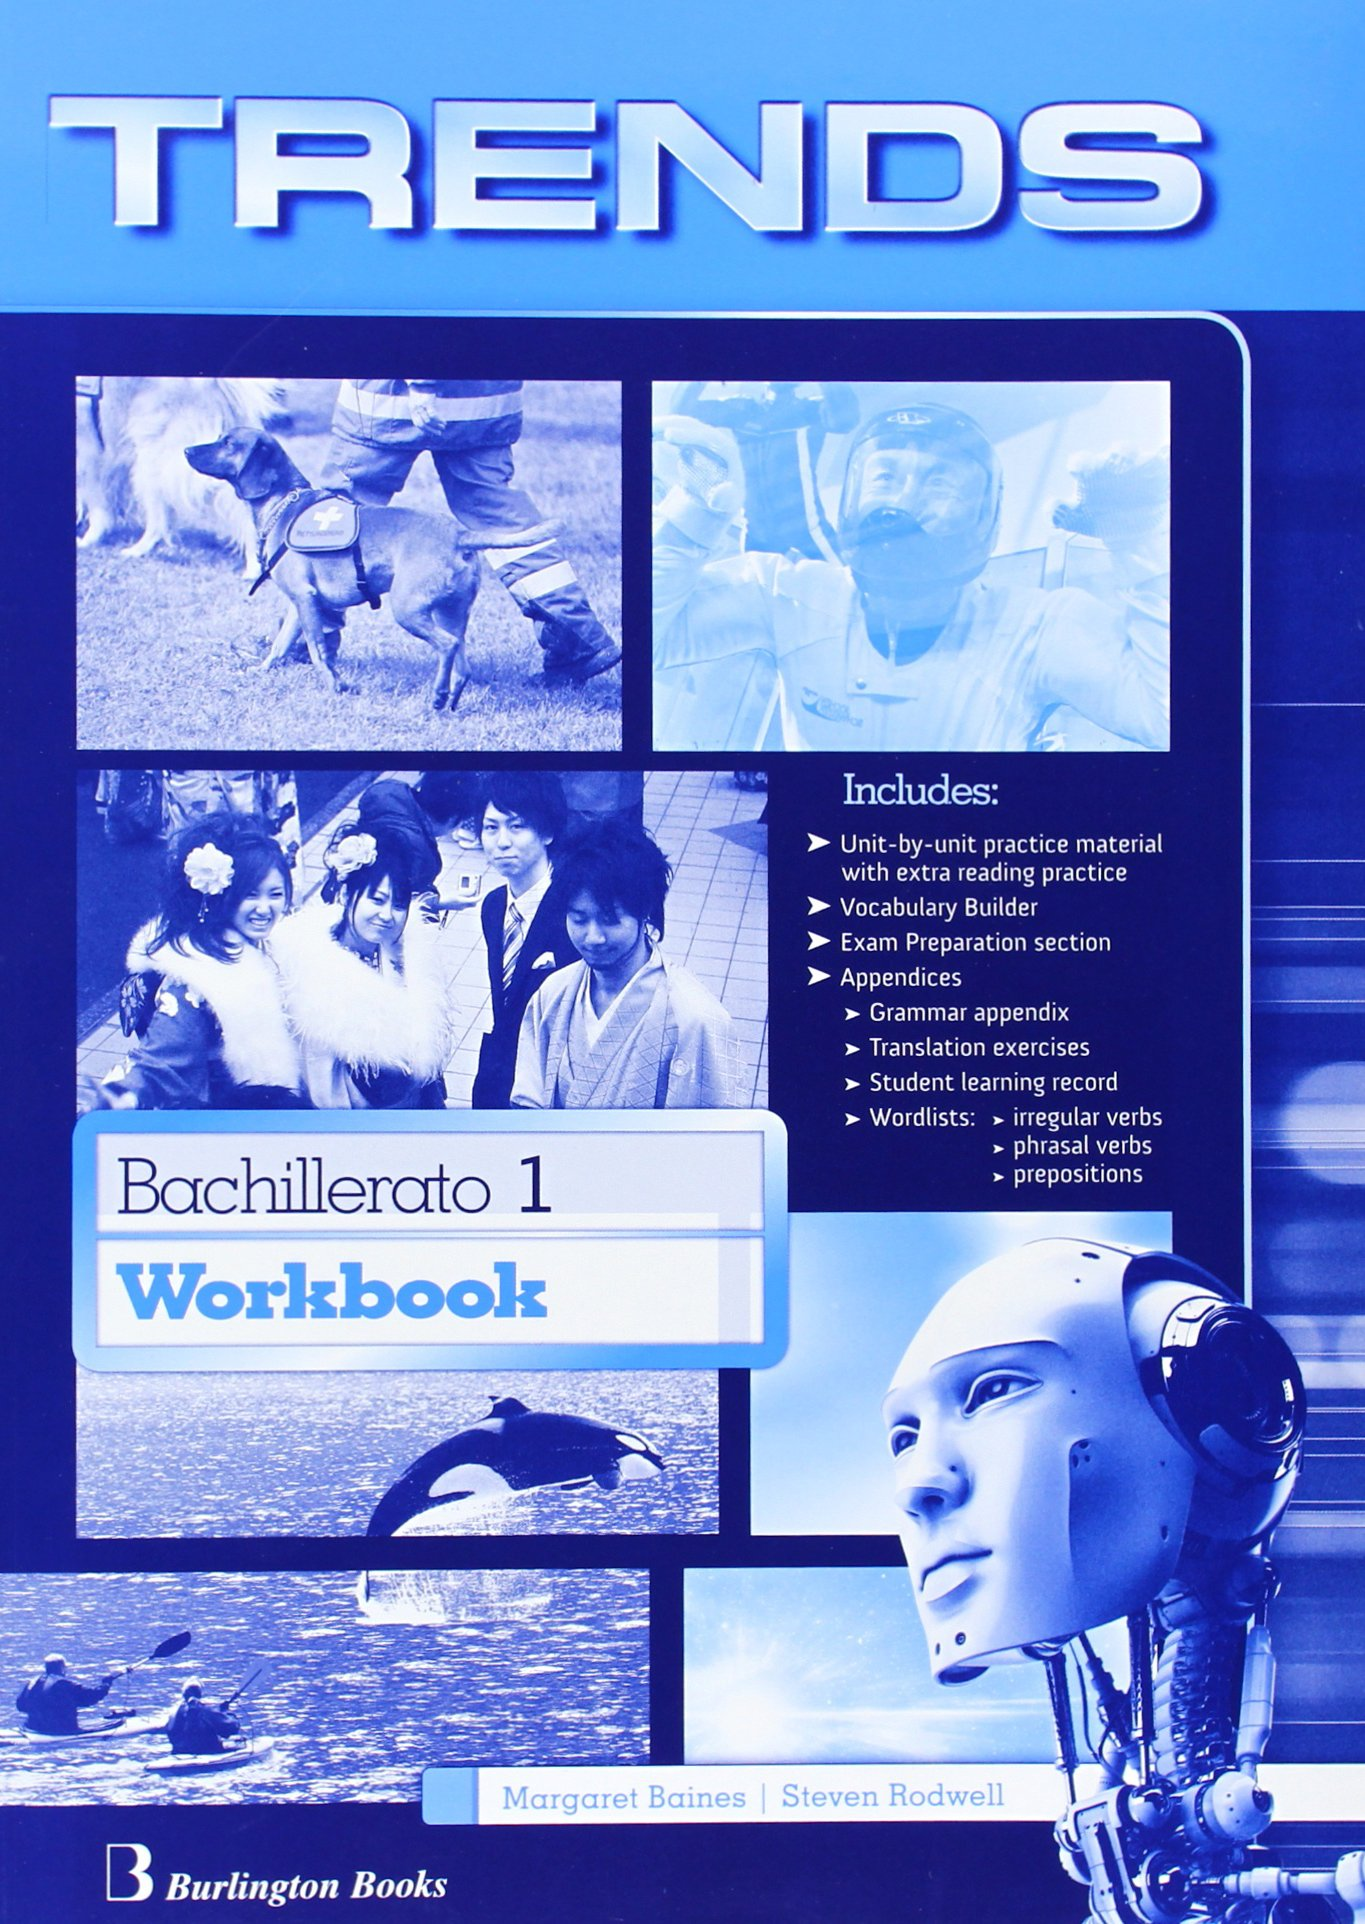 Trends 1. Workbook. Bachillerato 1 - Edition 2014 - 9789963510863 Tapa blanda – 29 abr 2014 Vv.Aa. Burlington 9963510868 YQ